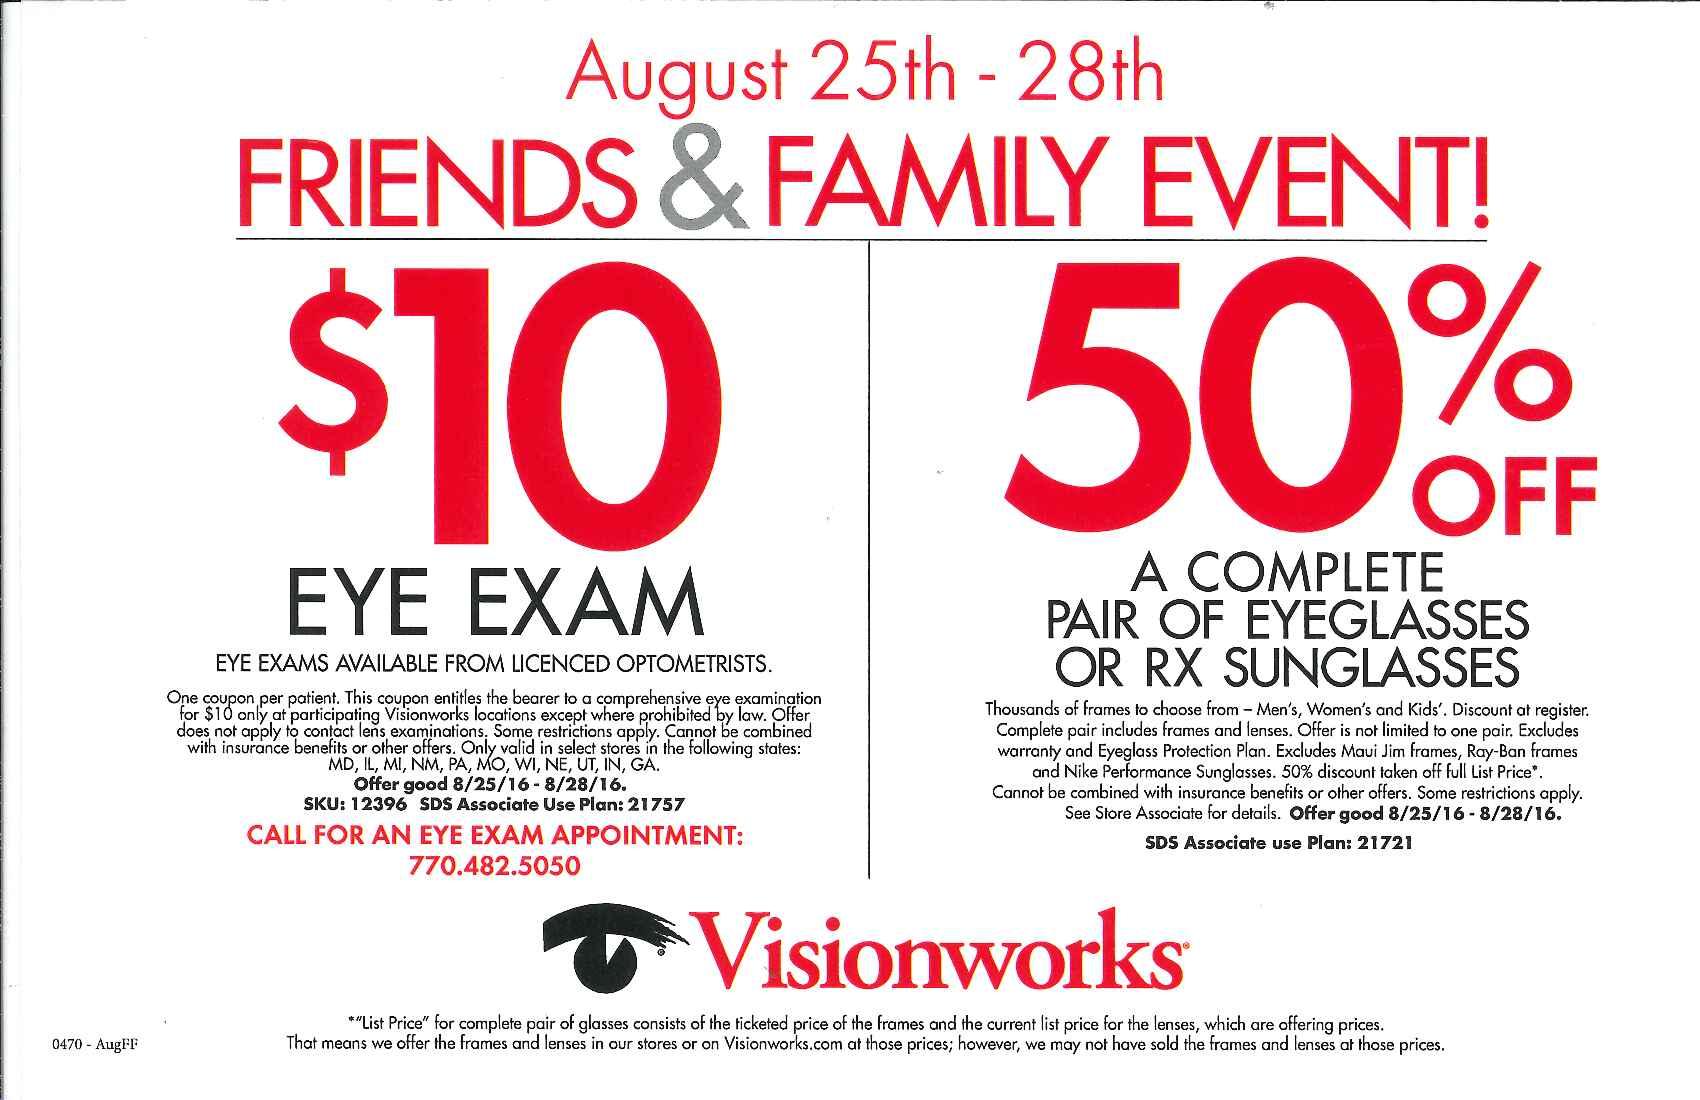 mall at stonecrest on twitter visionworks shopstonecrest friends family event august 25 28 httpstcoc6ohuqojqd